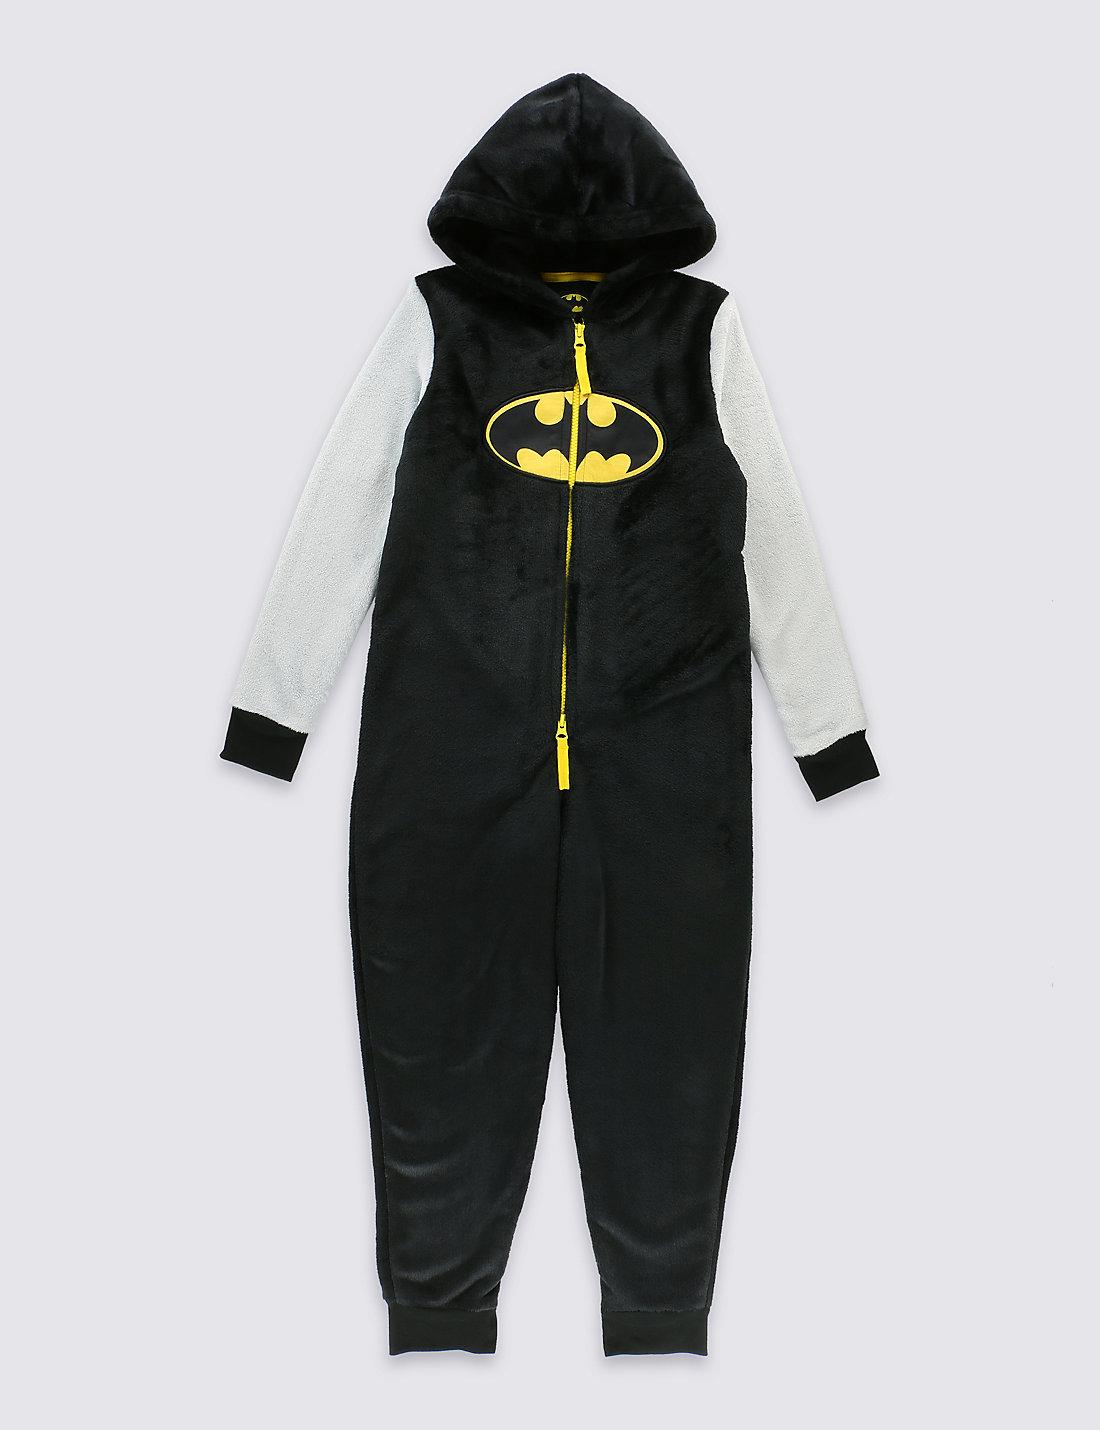 Onesie Superhero | Batman Onesie Boys | Batman Onesie